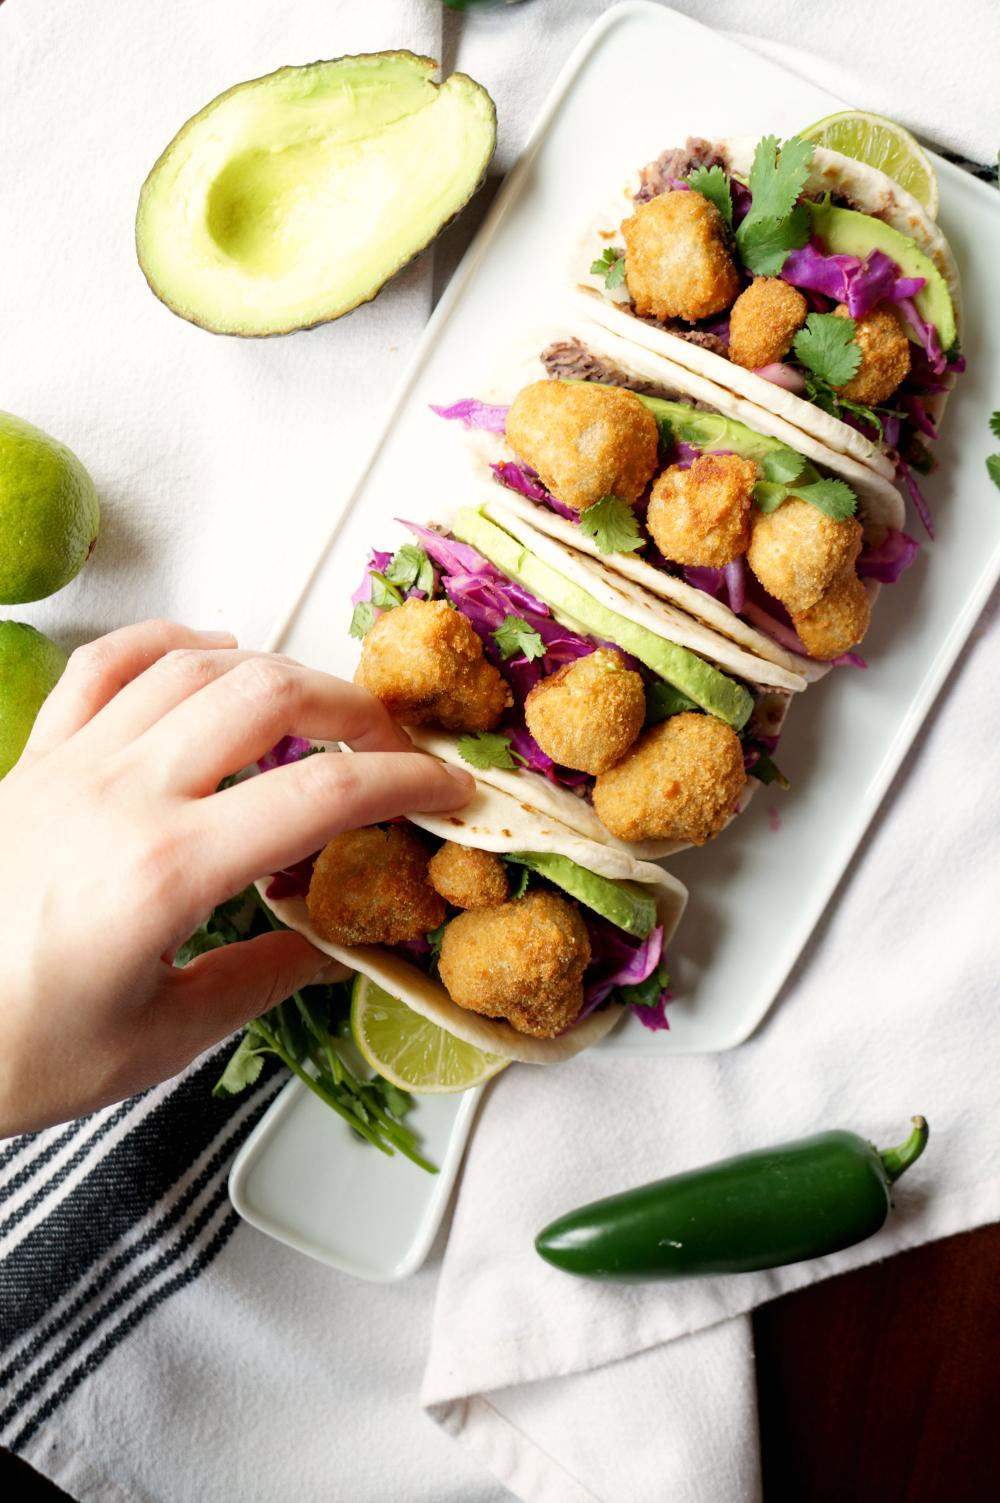 crispy mushroom street tacos with Farm Rich | The Baking Fairy